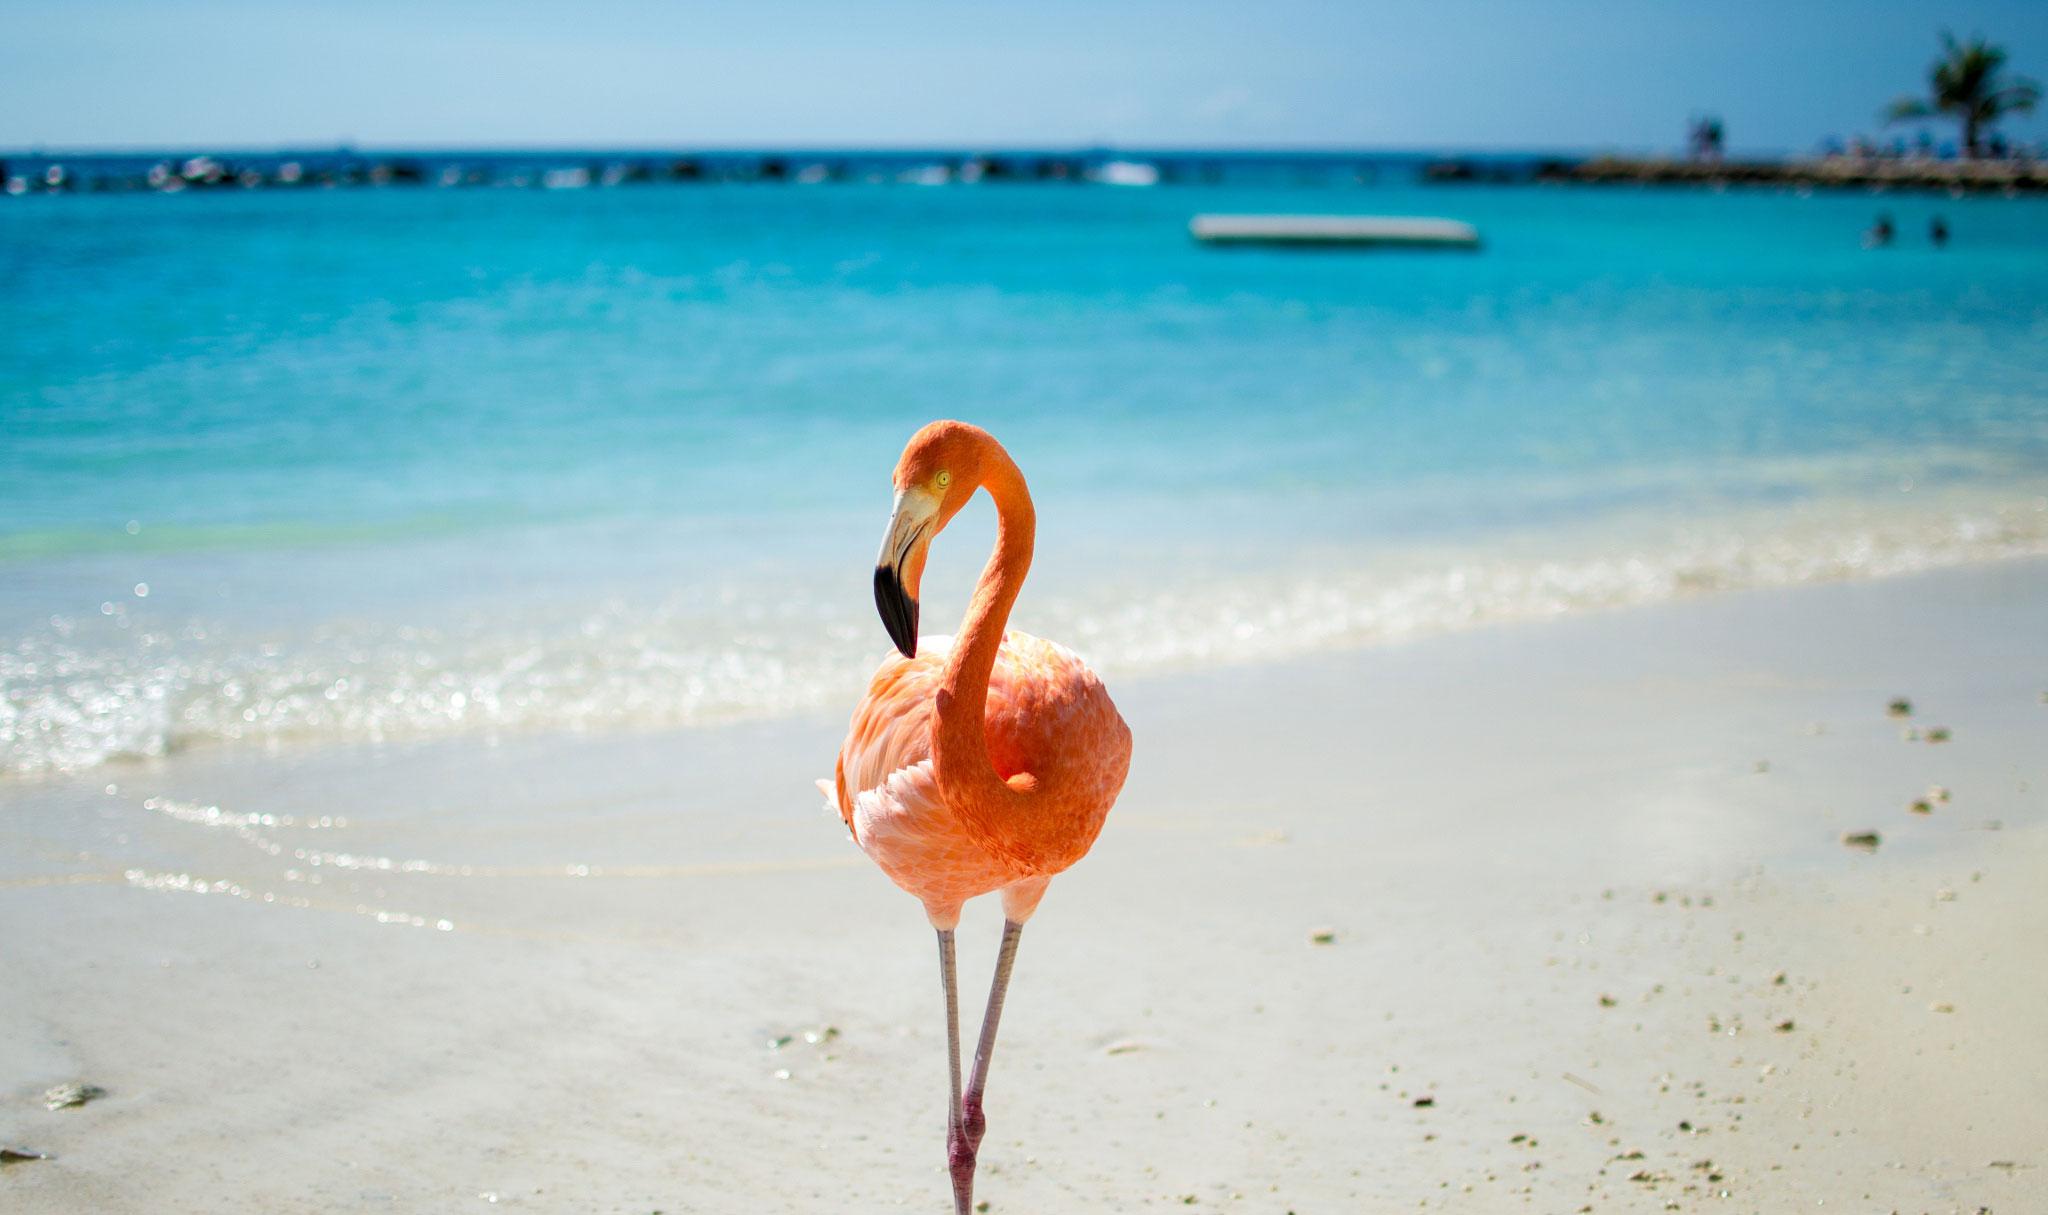 pink-flamingo-on-the-beach Surprisingly Ancient Species vol.1